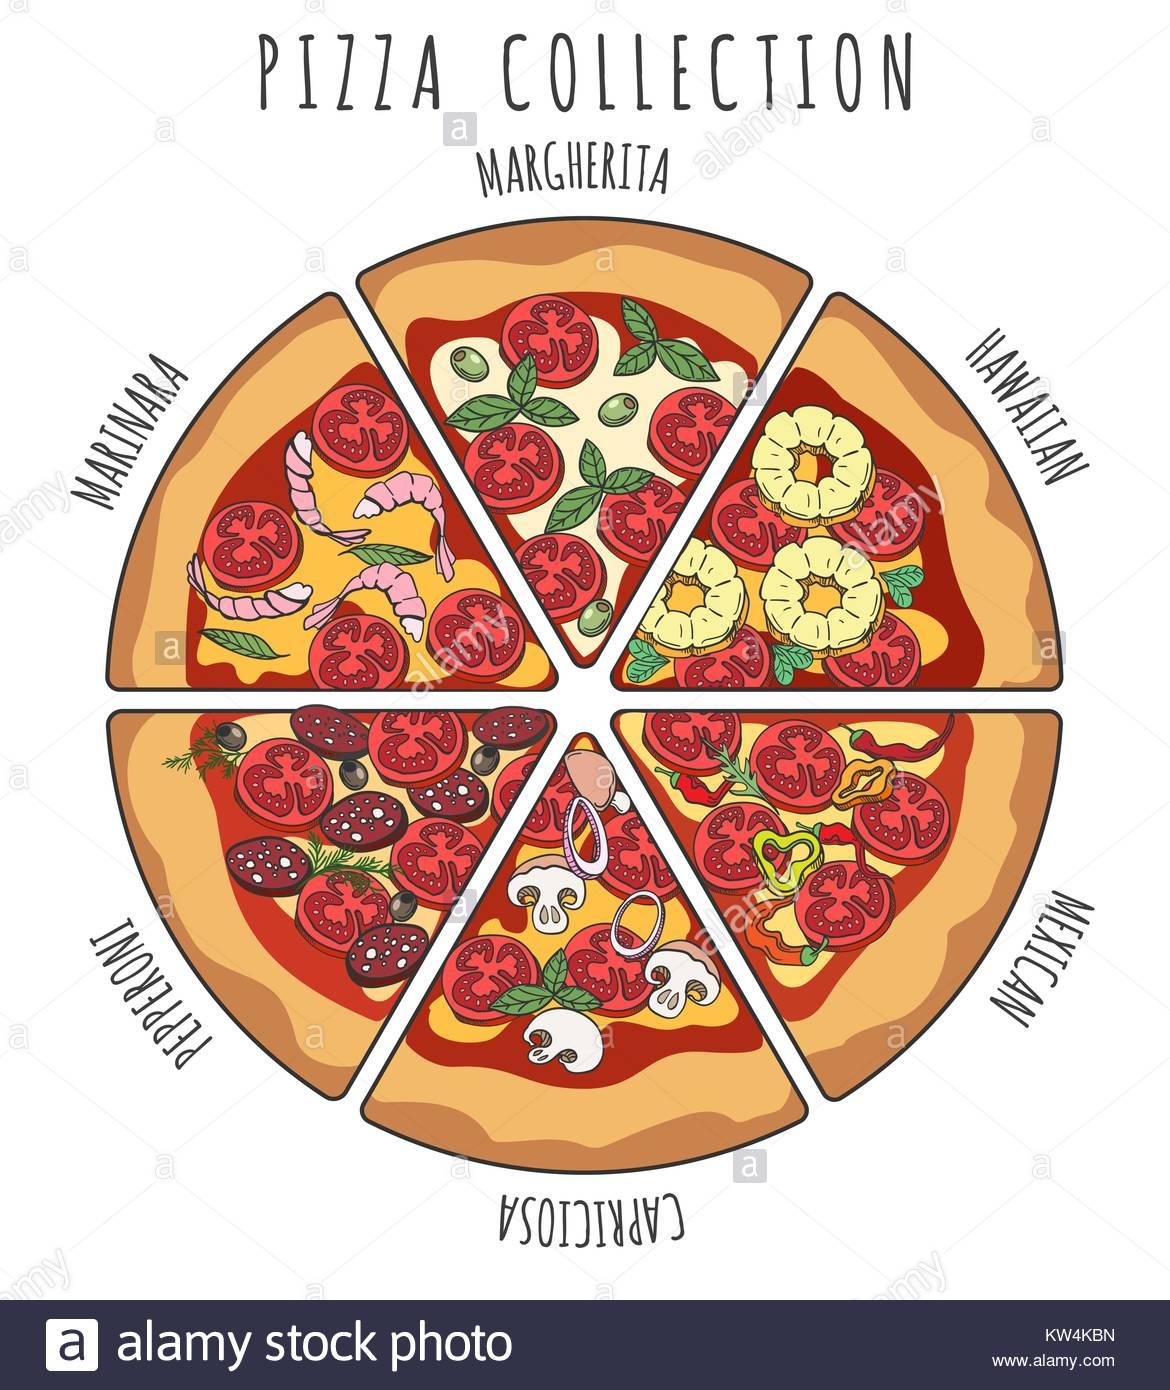 1170x1390 Pizza Slice Collection. Margherita Pepperoni, Hawaiian